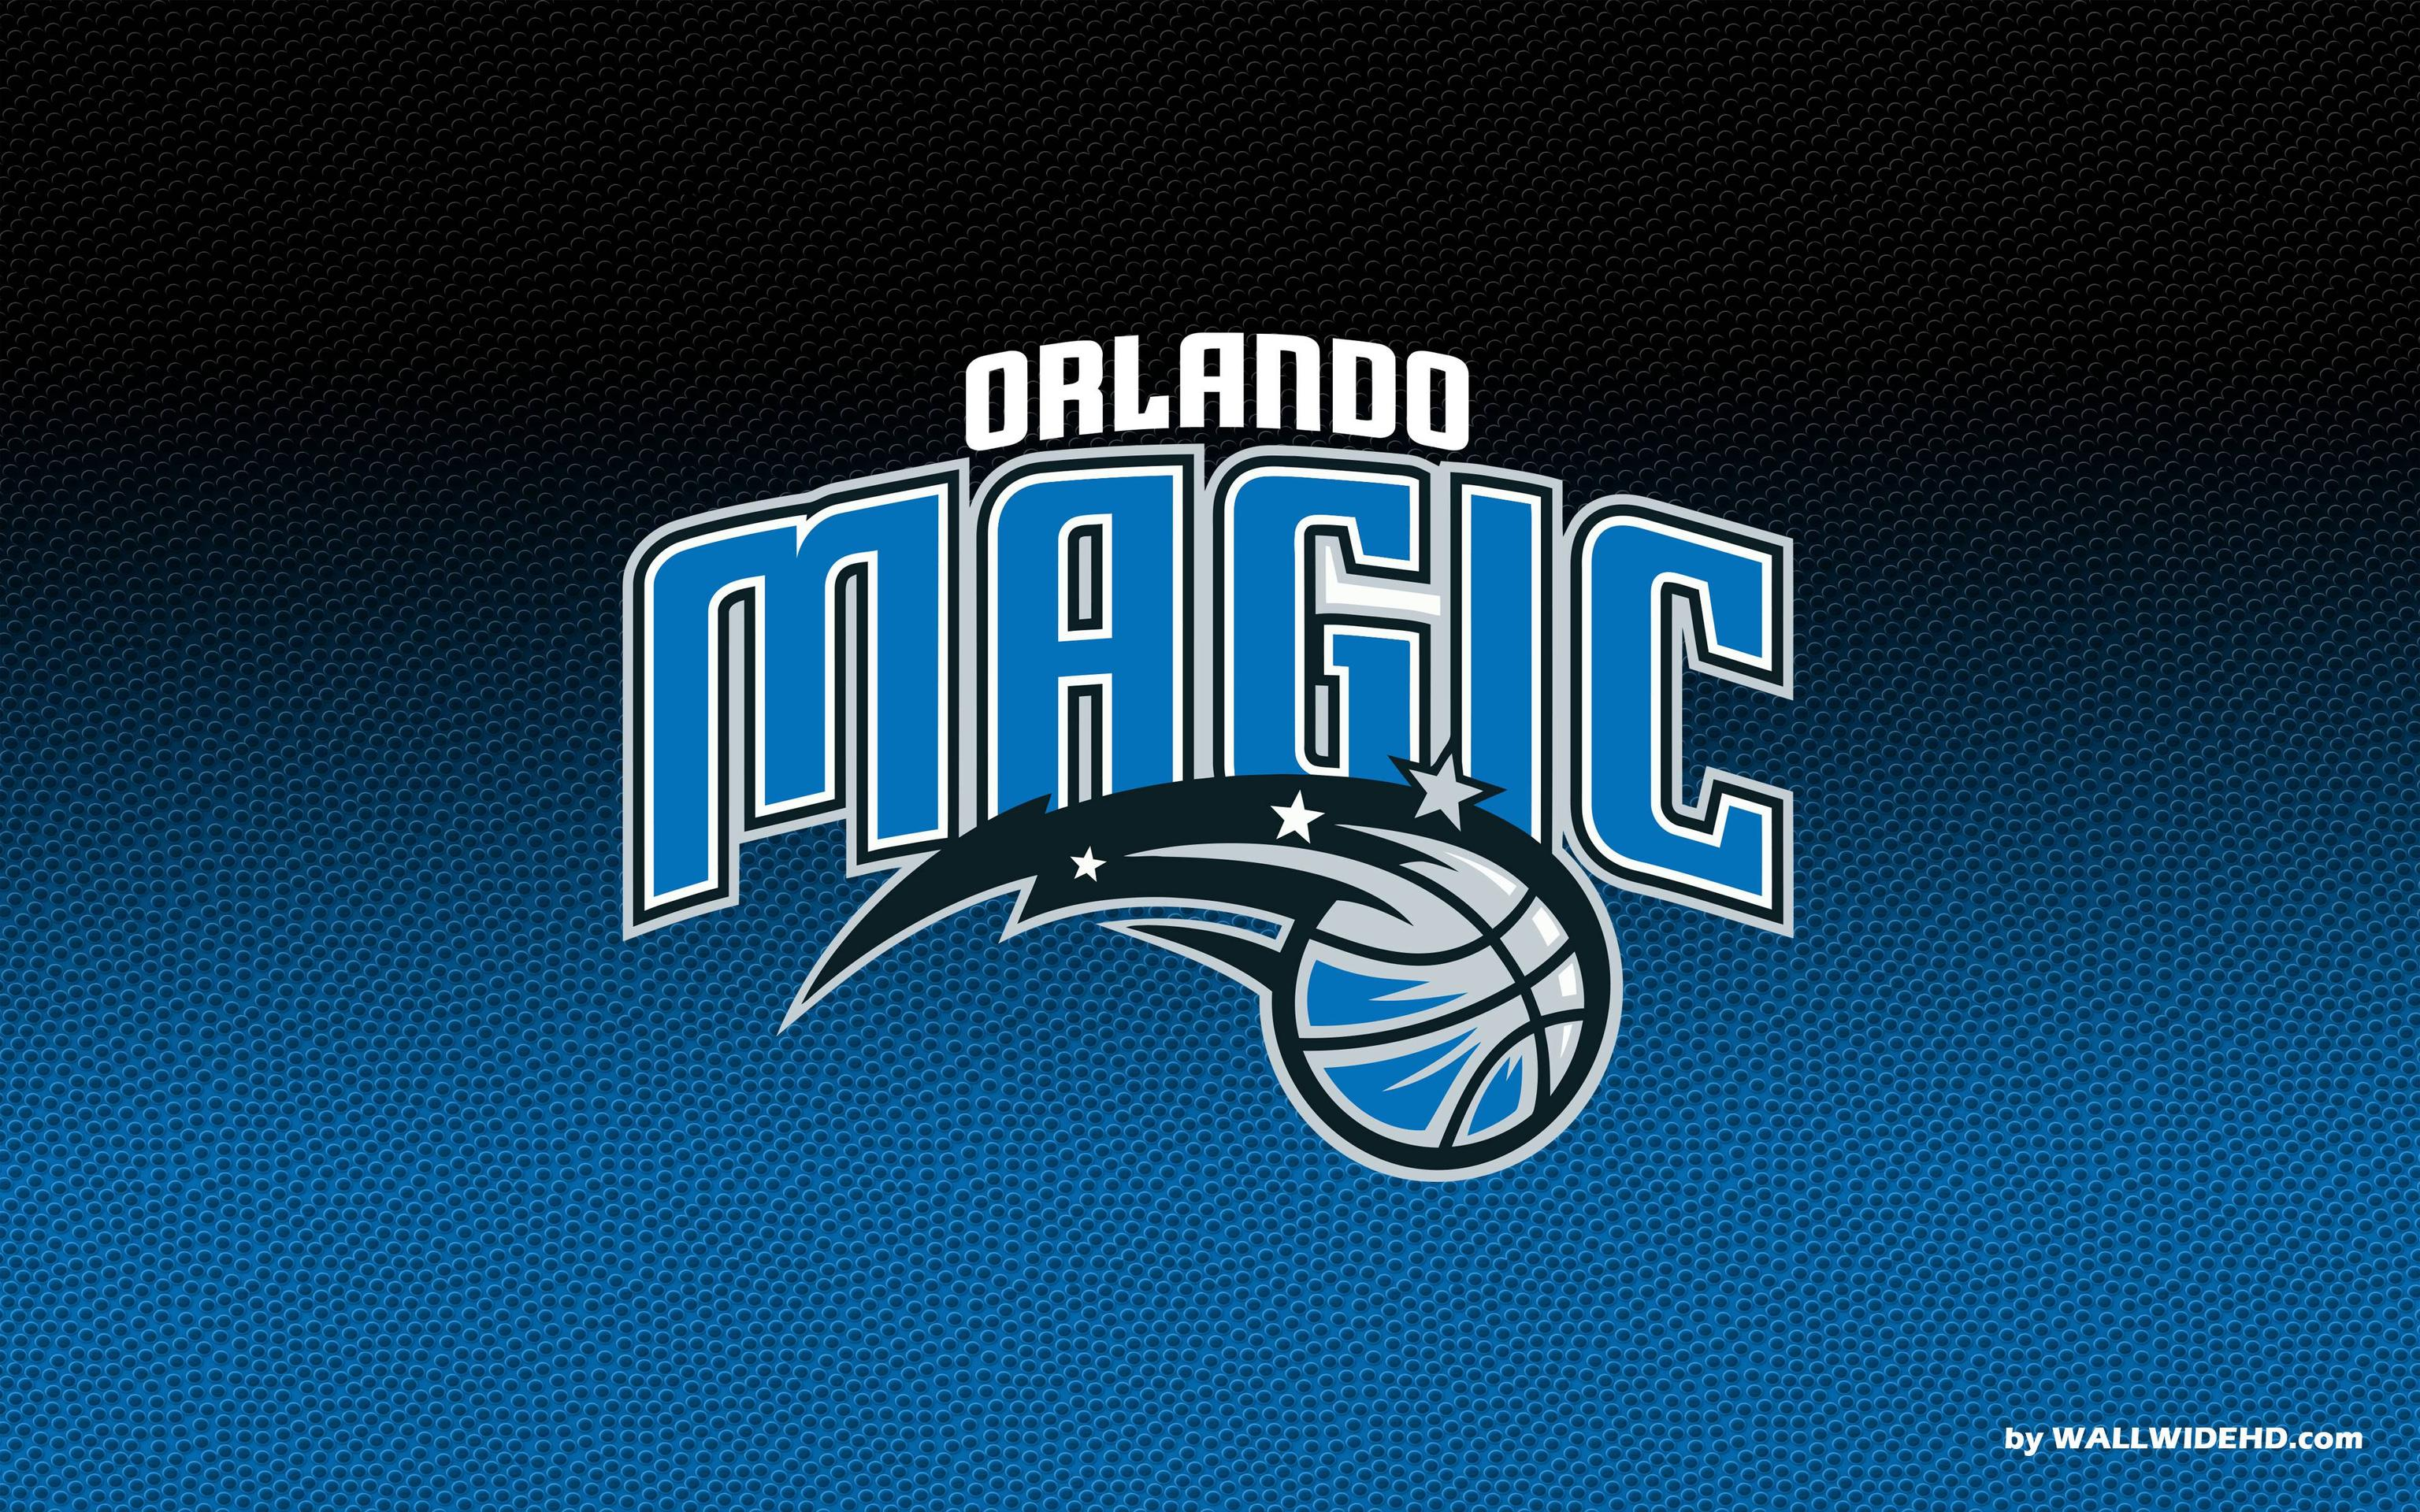 Orlando Magic 2014 Logo NBA Wallpaper Wide or HD Sports Wallpapers 3072x1920